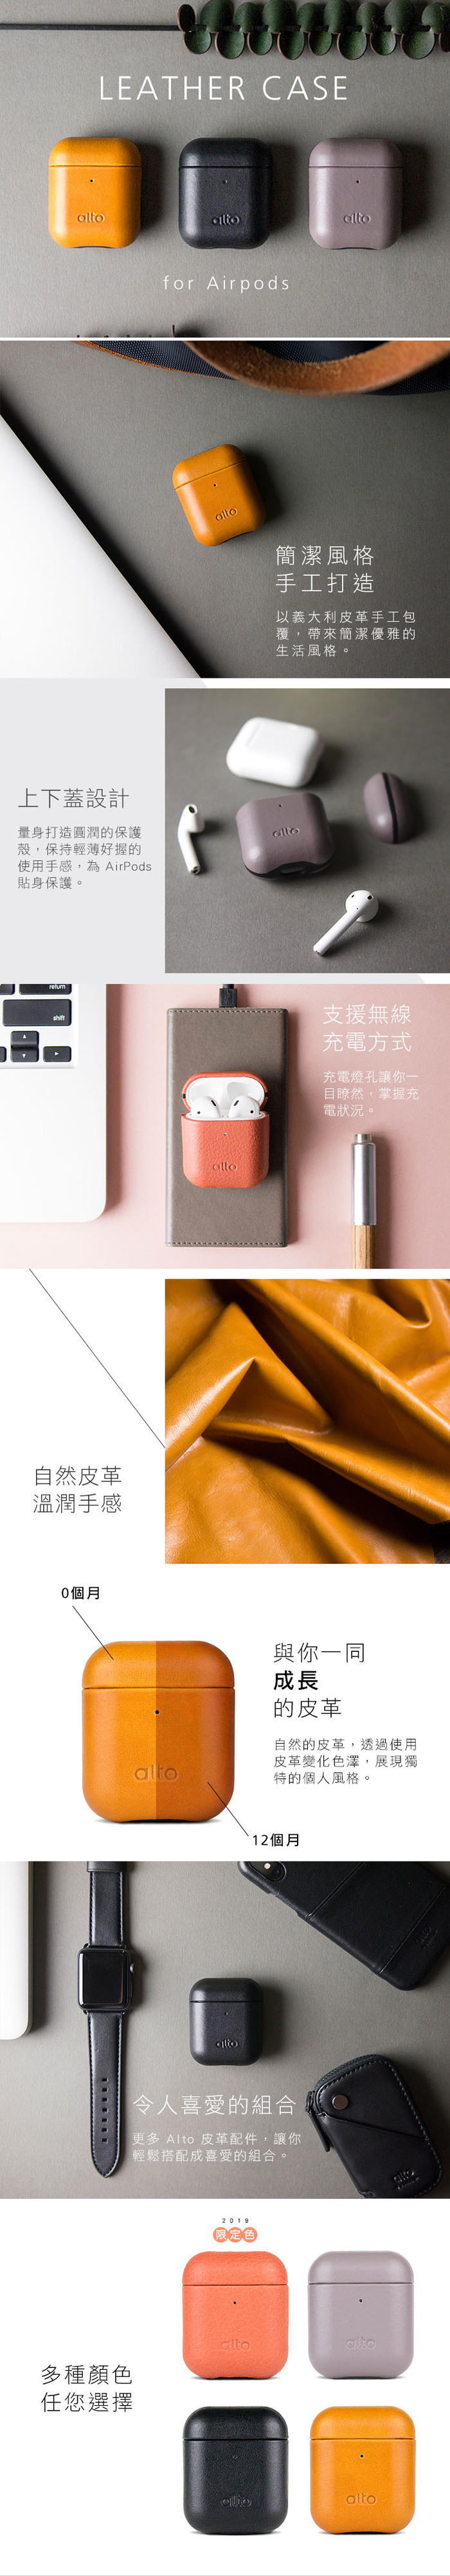 Alto|AirPods 皮革保護套 (焦糖棕)